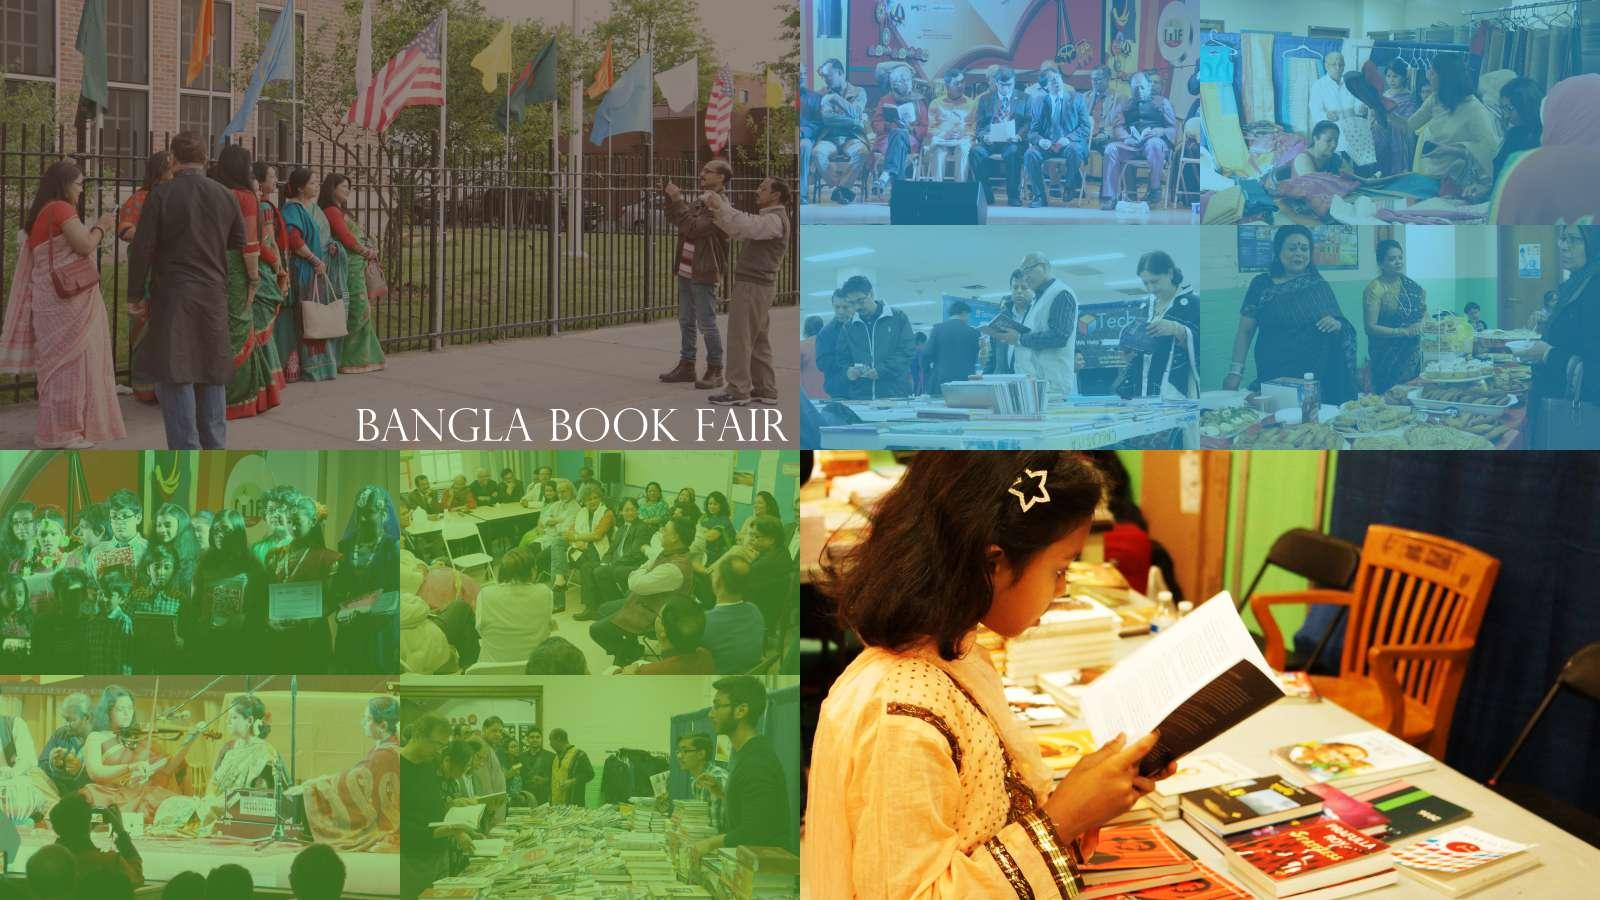 Book, Bangla and Bangladeshi community in New York